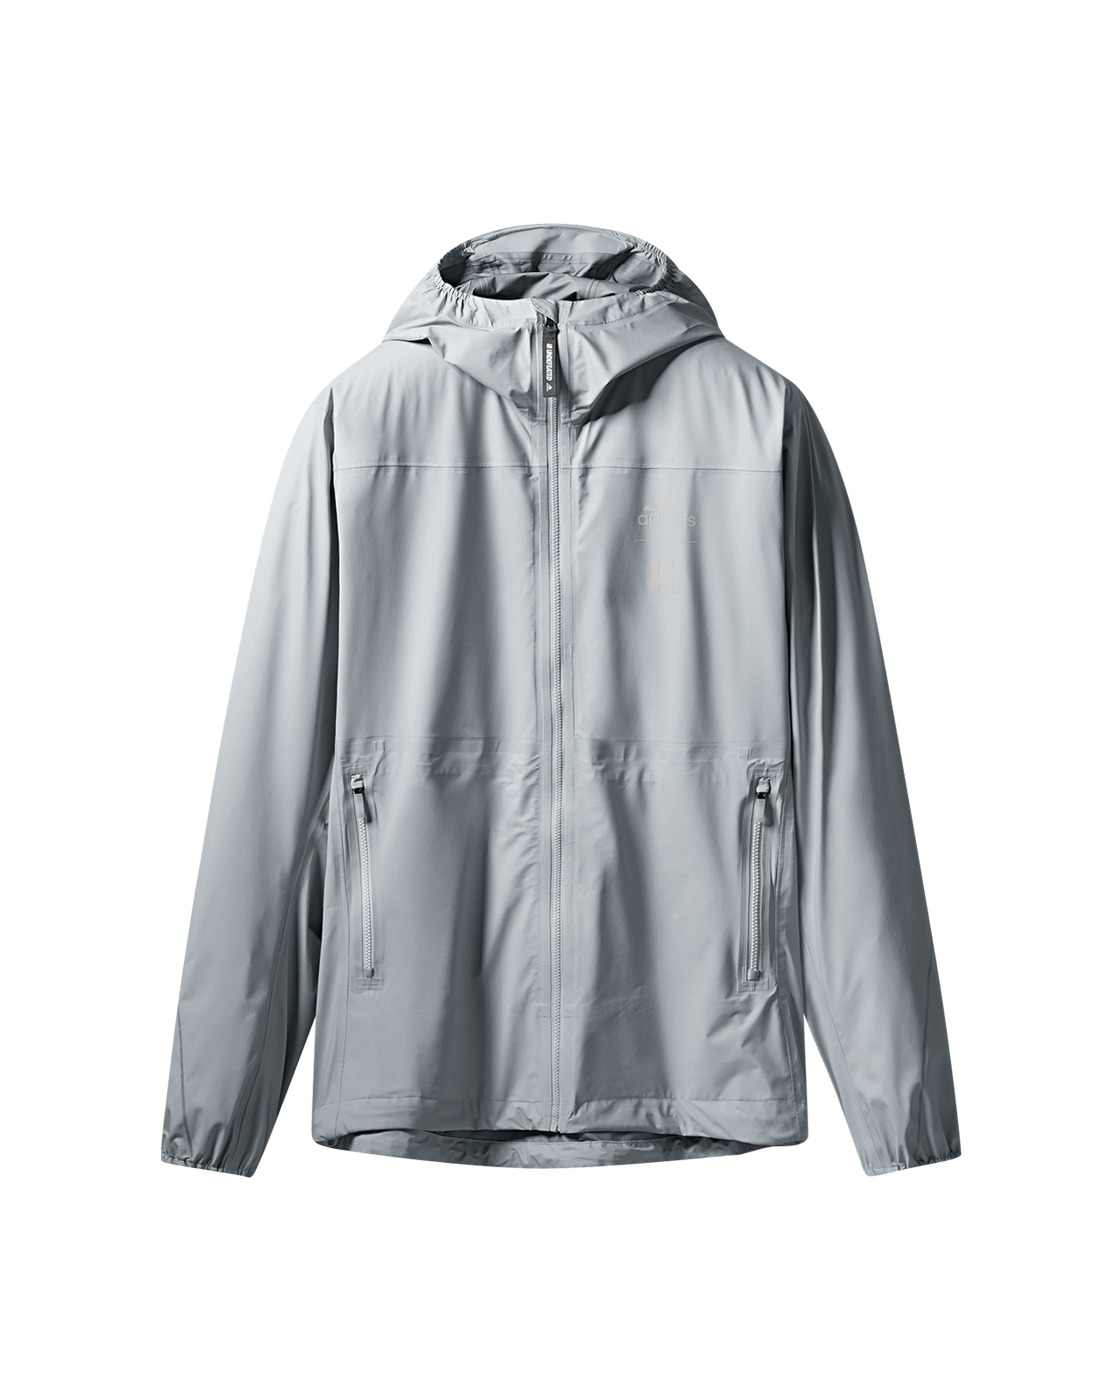 Photo: Adidas Originals Adidas X Undefeated Goretex Jacket Clear Onix/Black